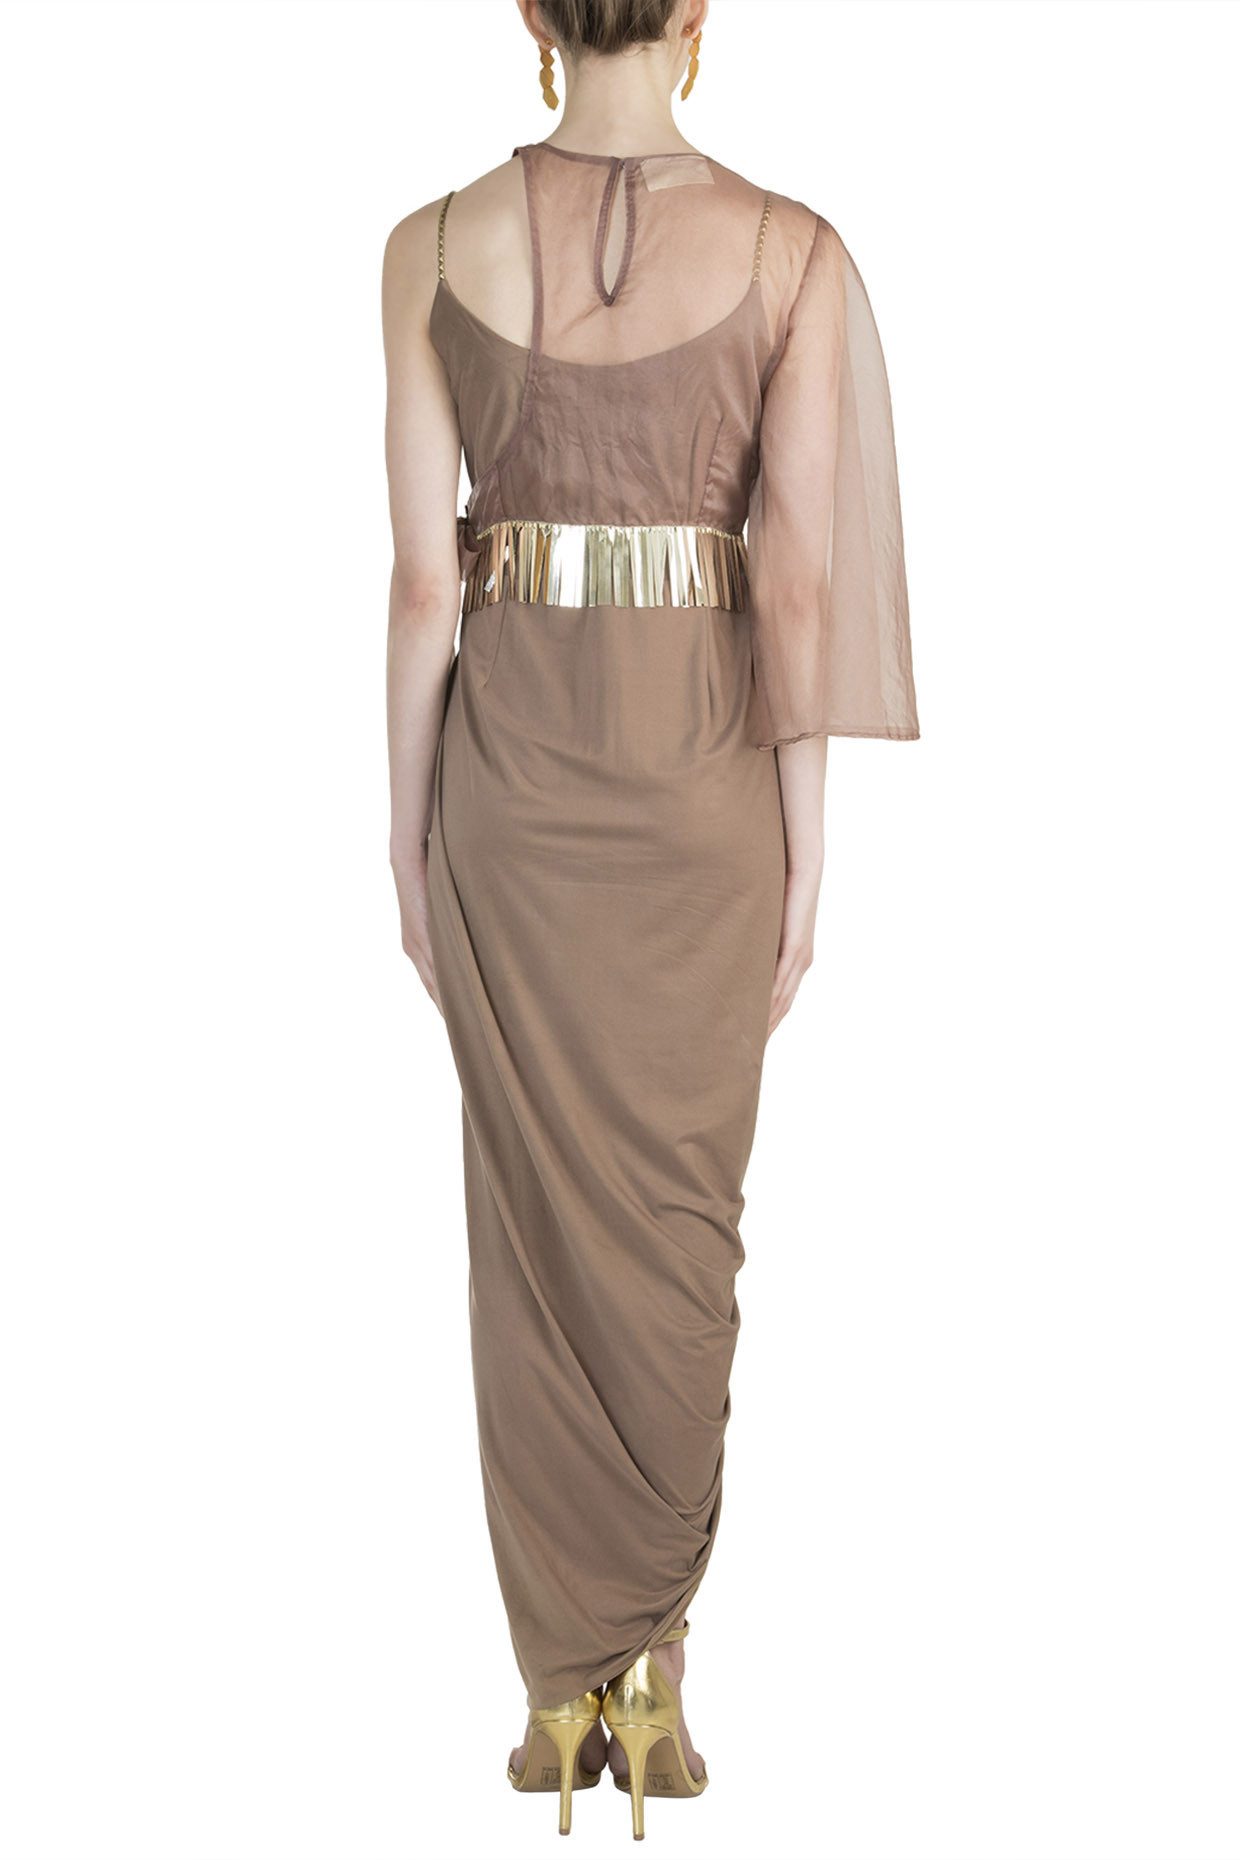 Copper Bodysuit Dress With Jacket by Rishi & Vibhuti